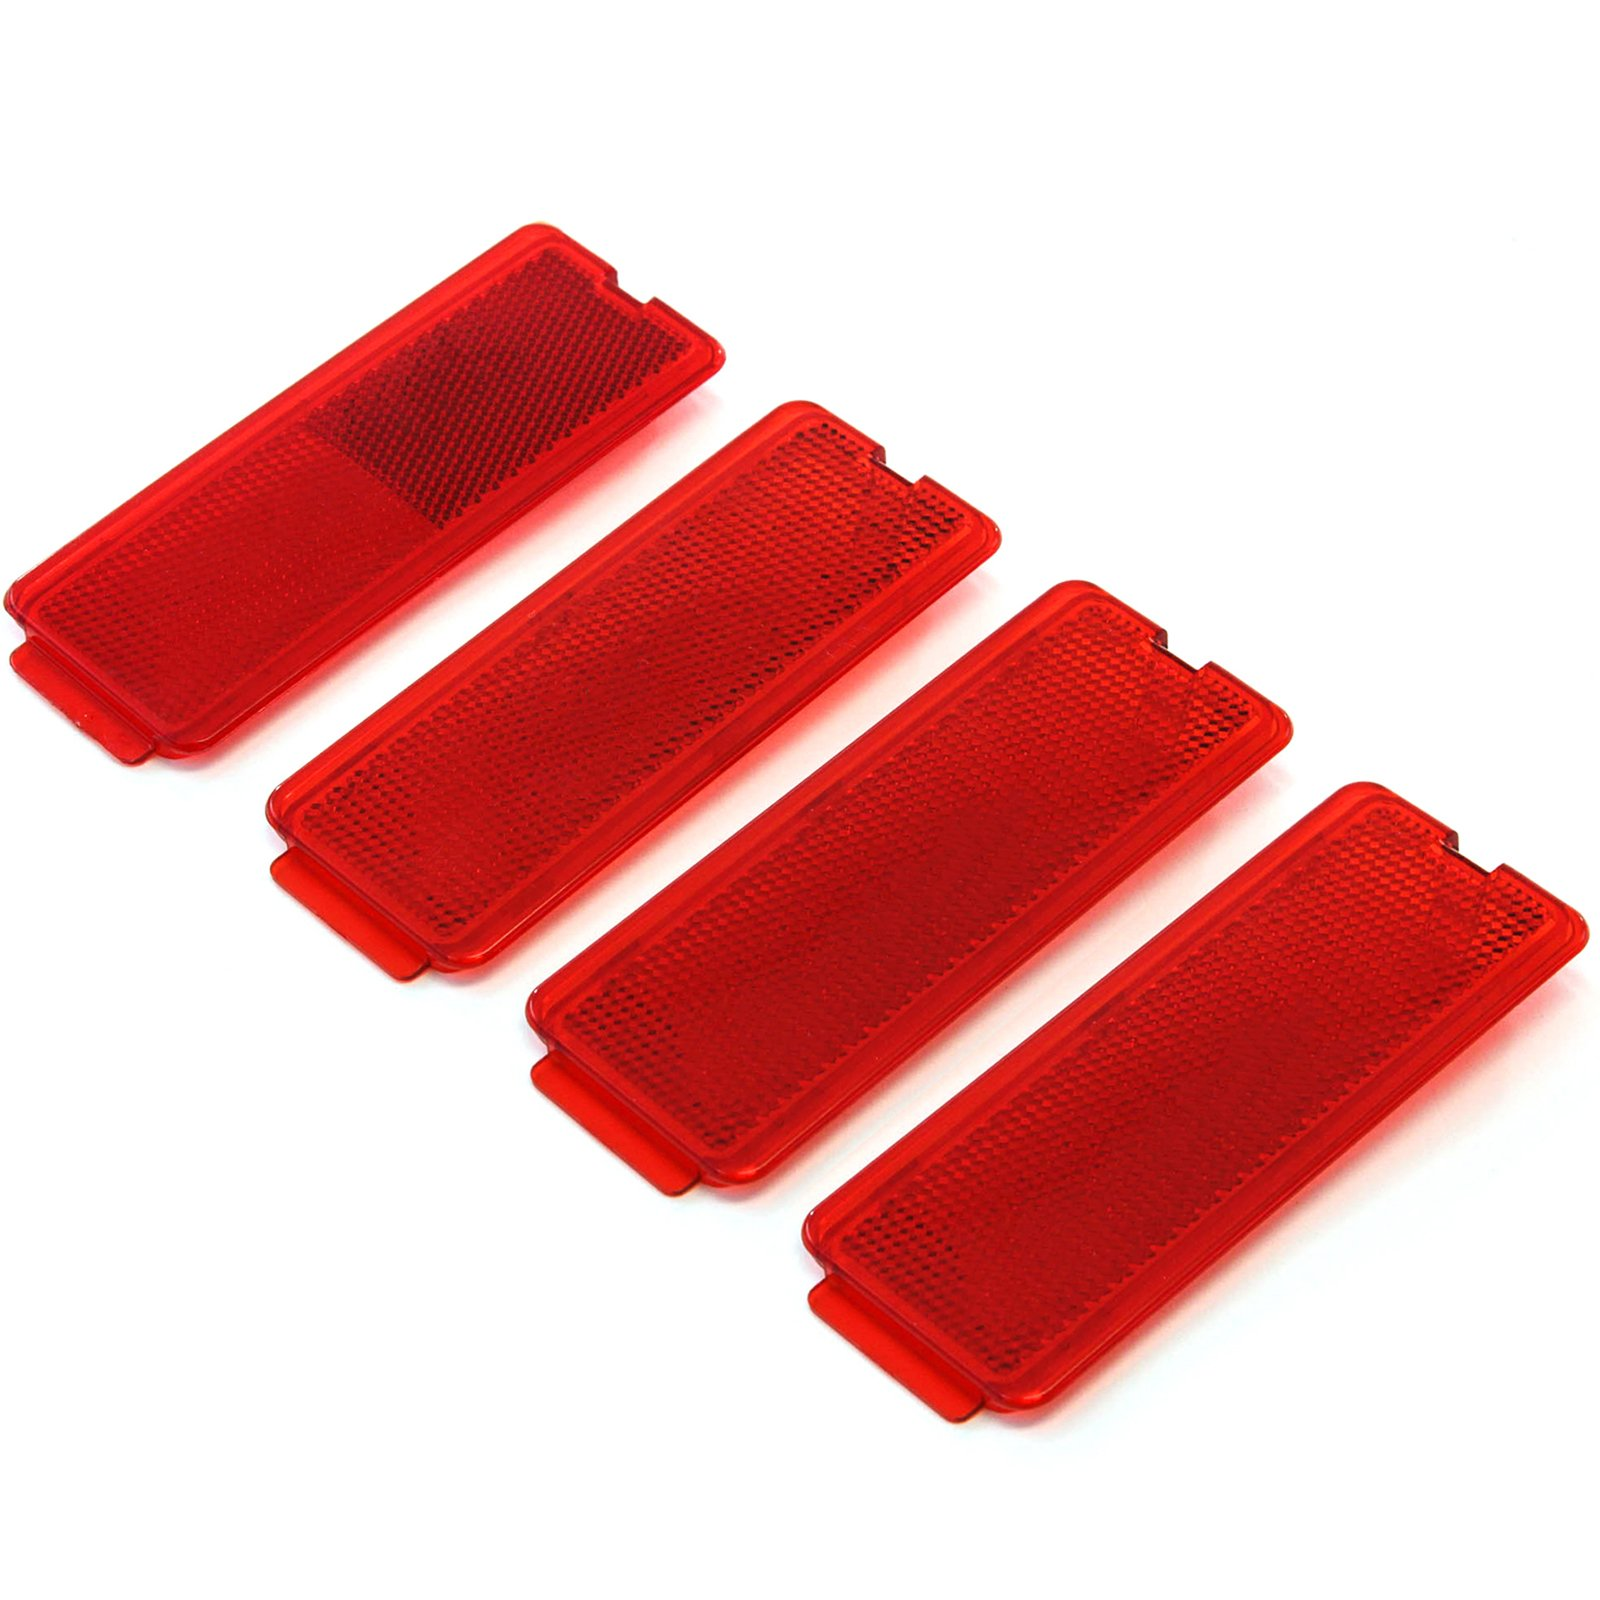 4 Premium Door Reflectors Interior Red Compatible with Ford (1999-2007 SuperDuty F250 F350 F450 F550 Super Duty & 2000-2005 Excursion)